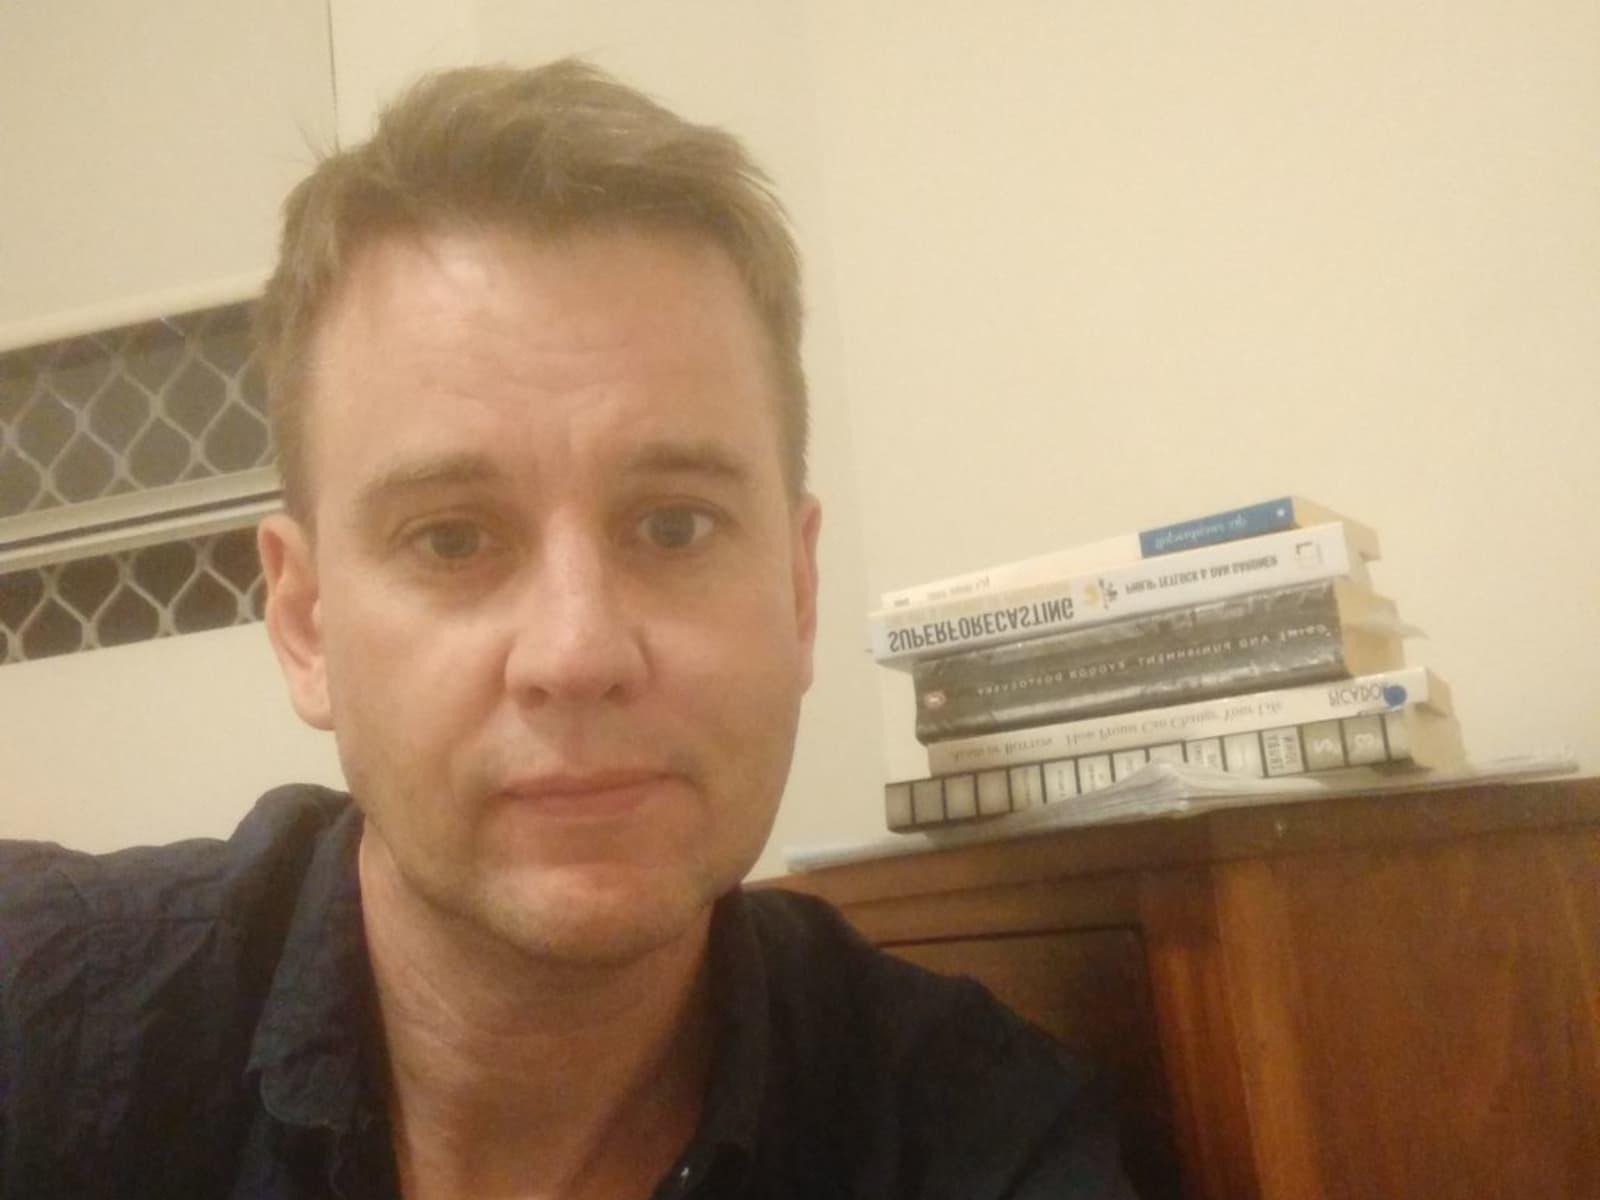 Ben from Brisbane, Queensland, Australia